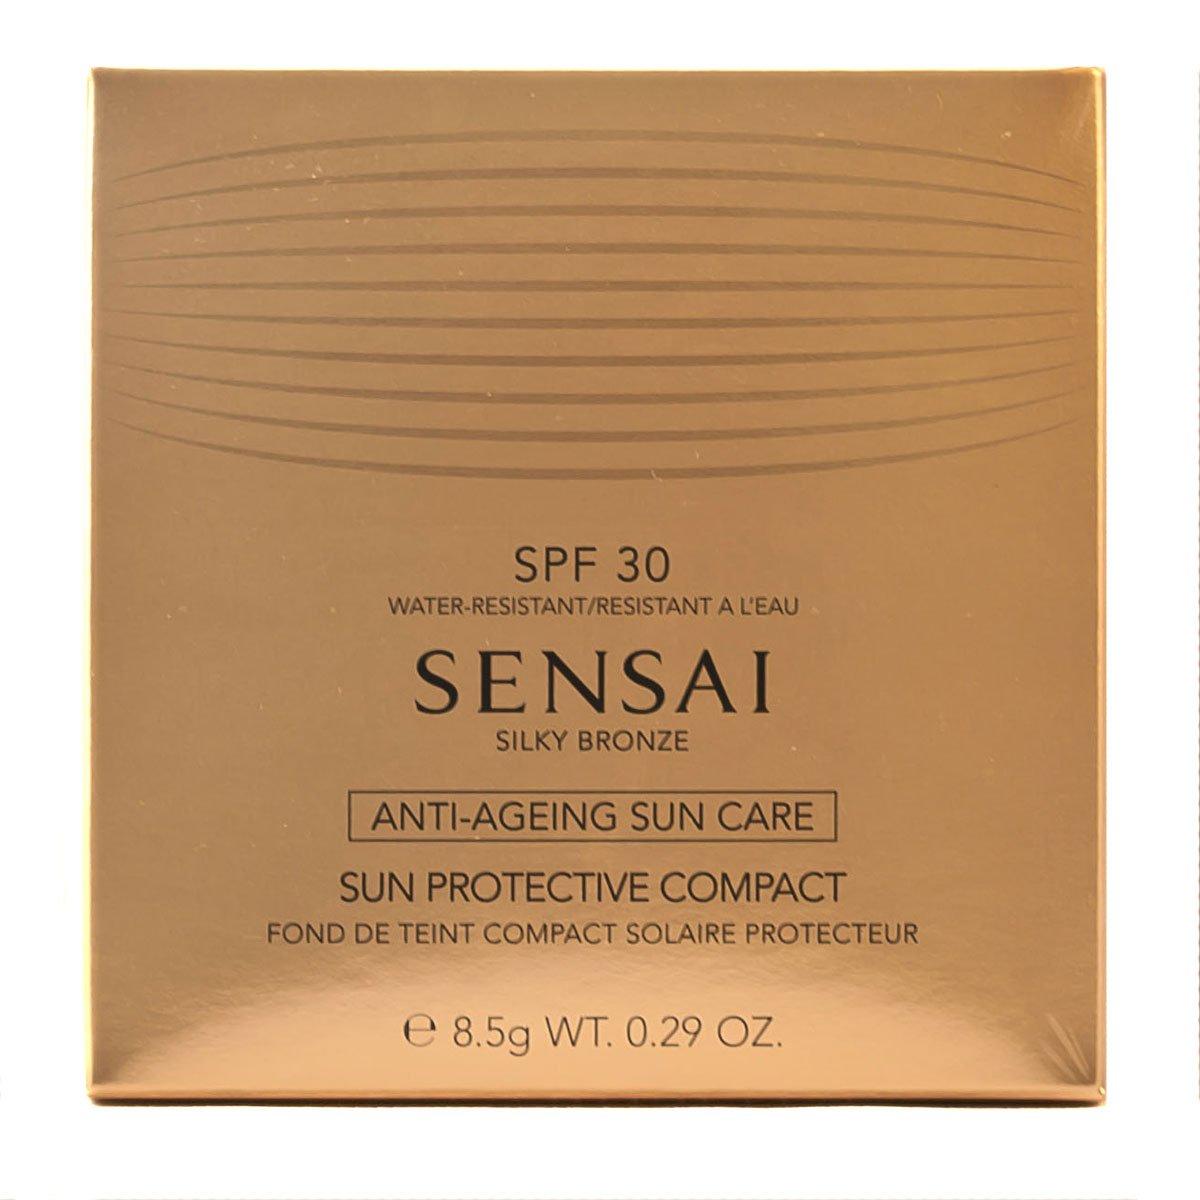 Sensai Silky Bronze femme/woman, Sun Protective Compact SPF30 Nr. SC02 Natural, 1er Pack (1 x 9 g) Kanebo 4973167902806 45799